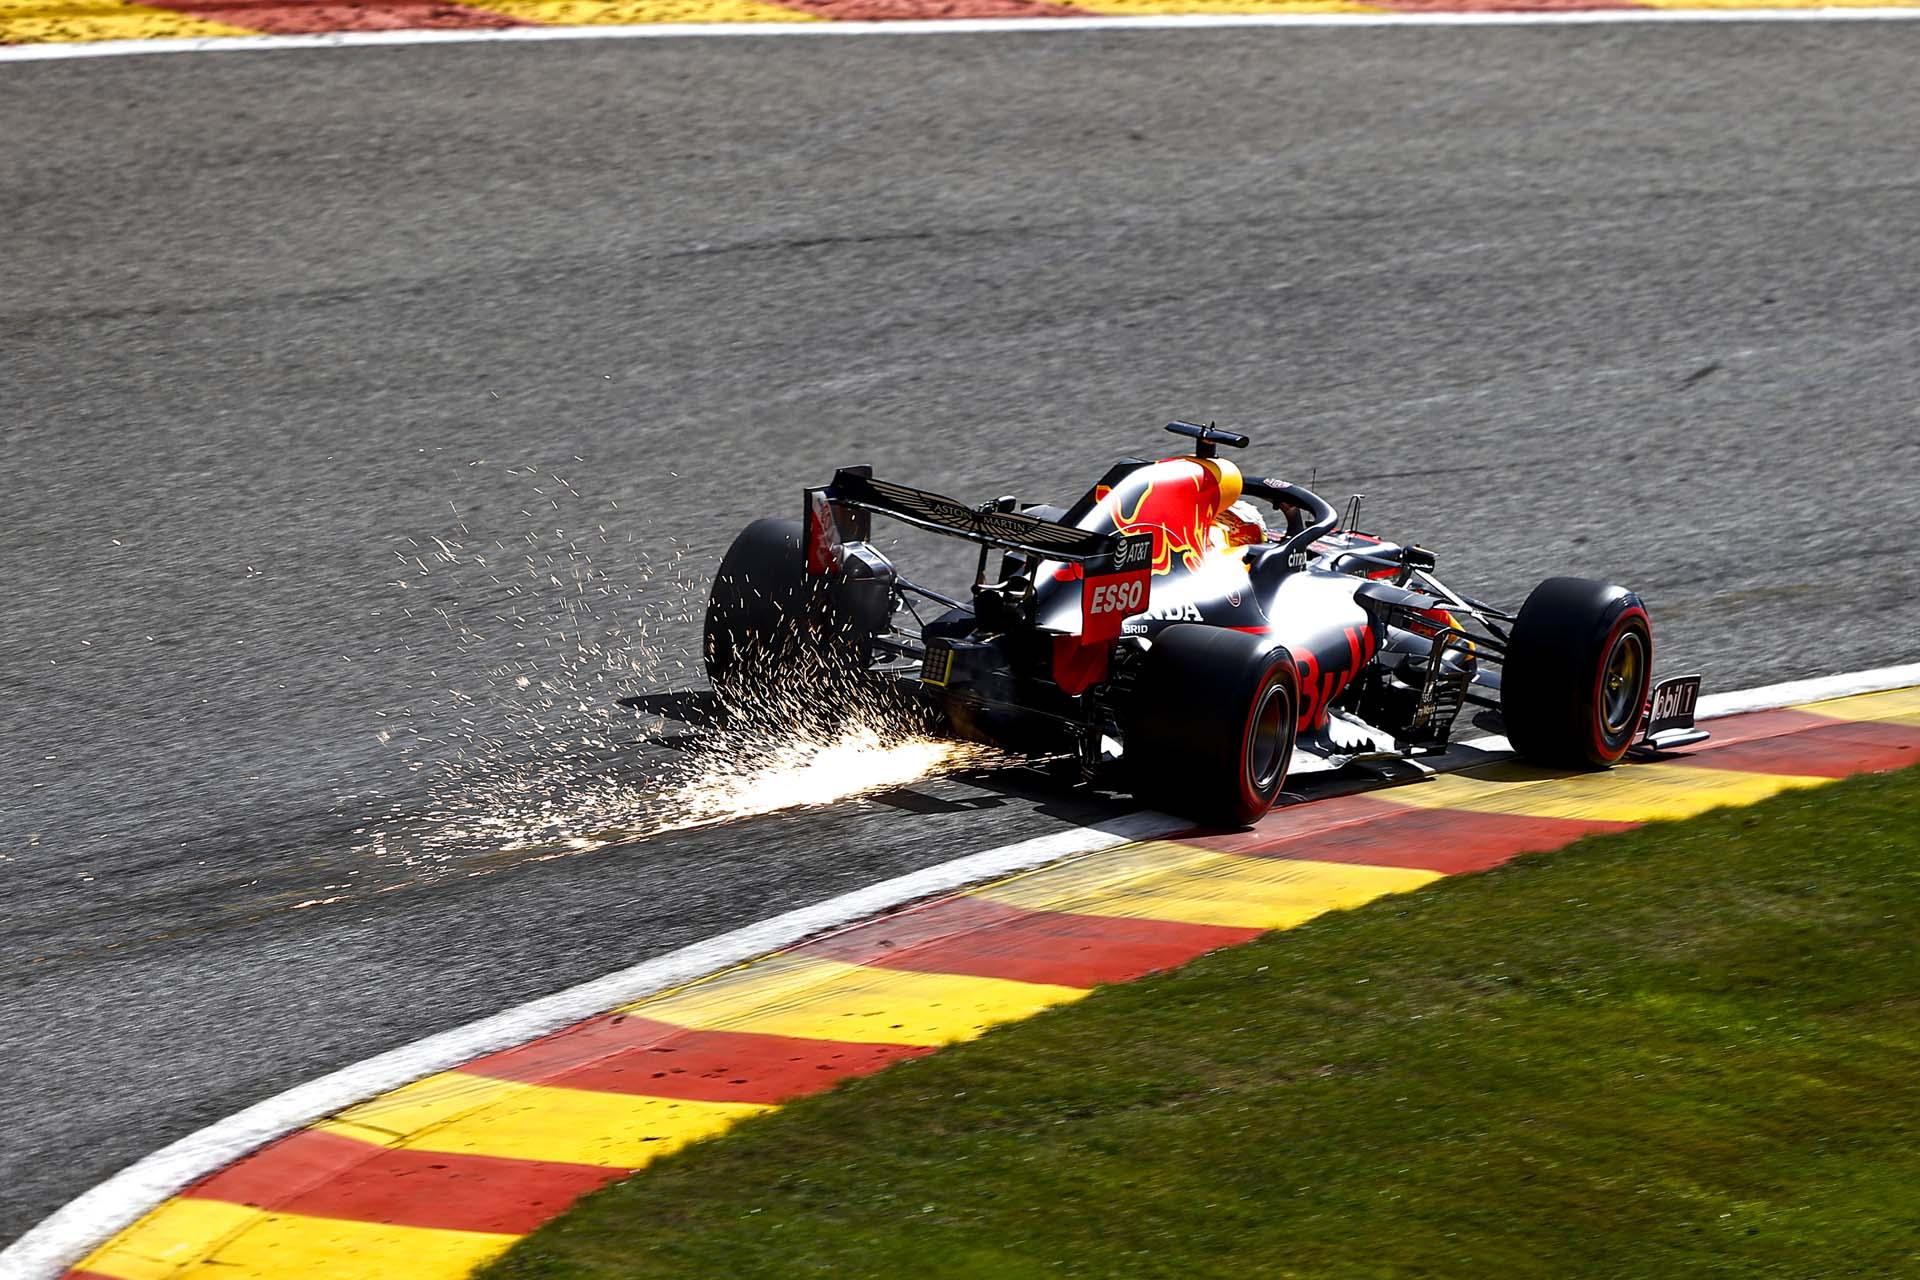 2020 Belgian GP